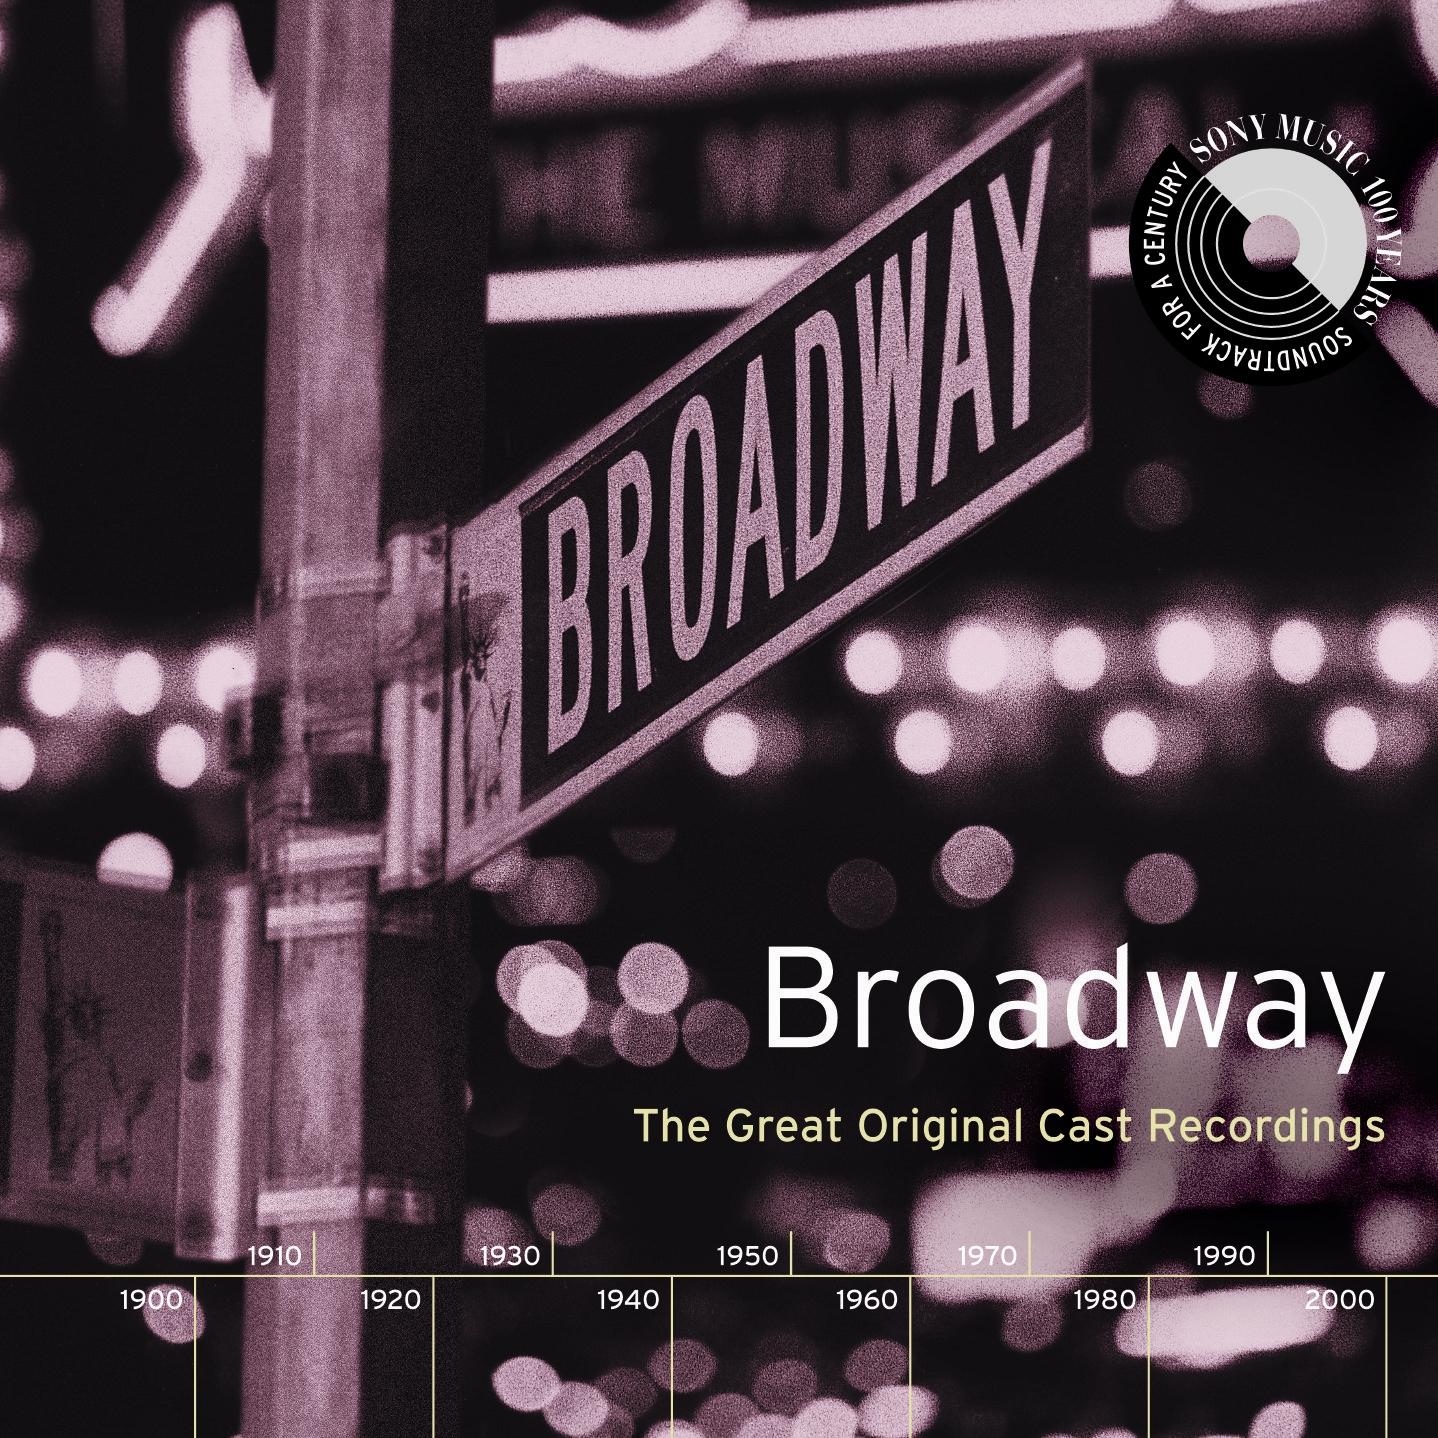 Broadway: The Great Original Cast Recordings